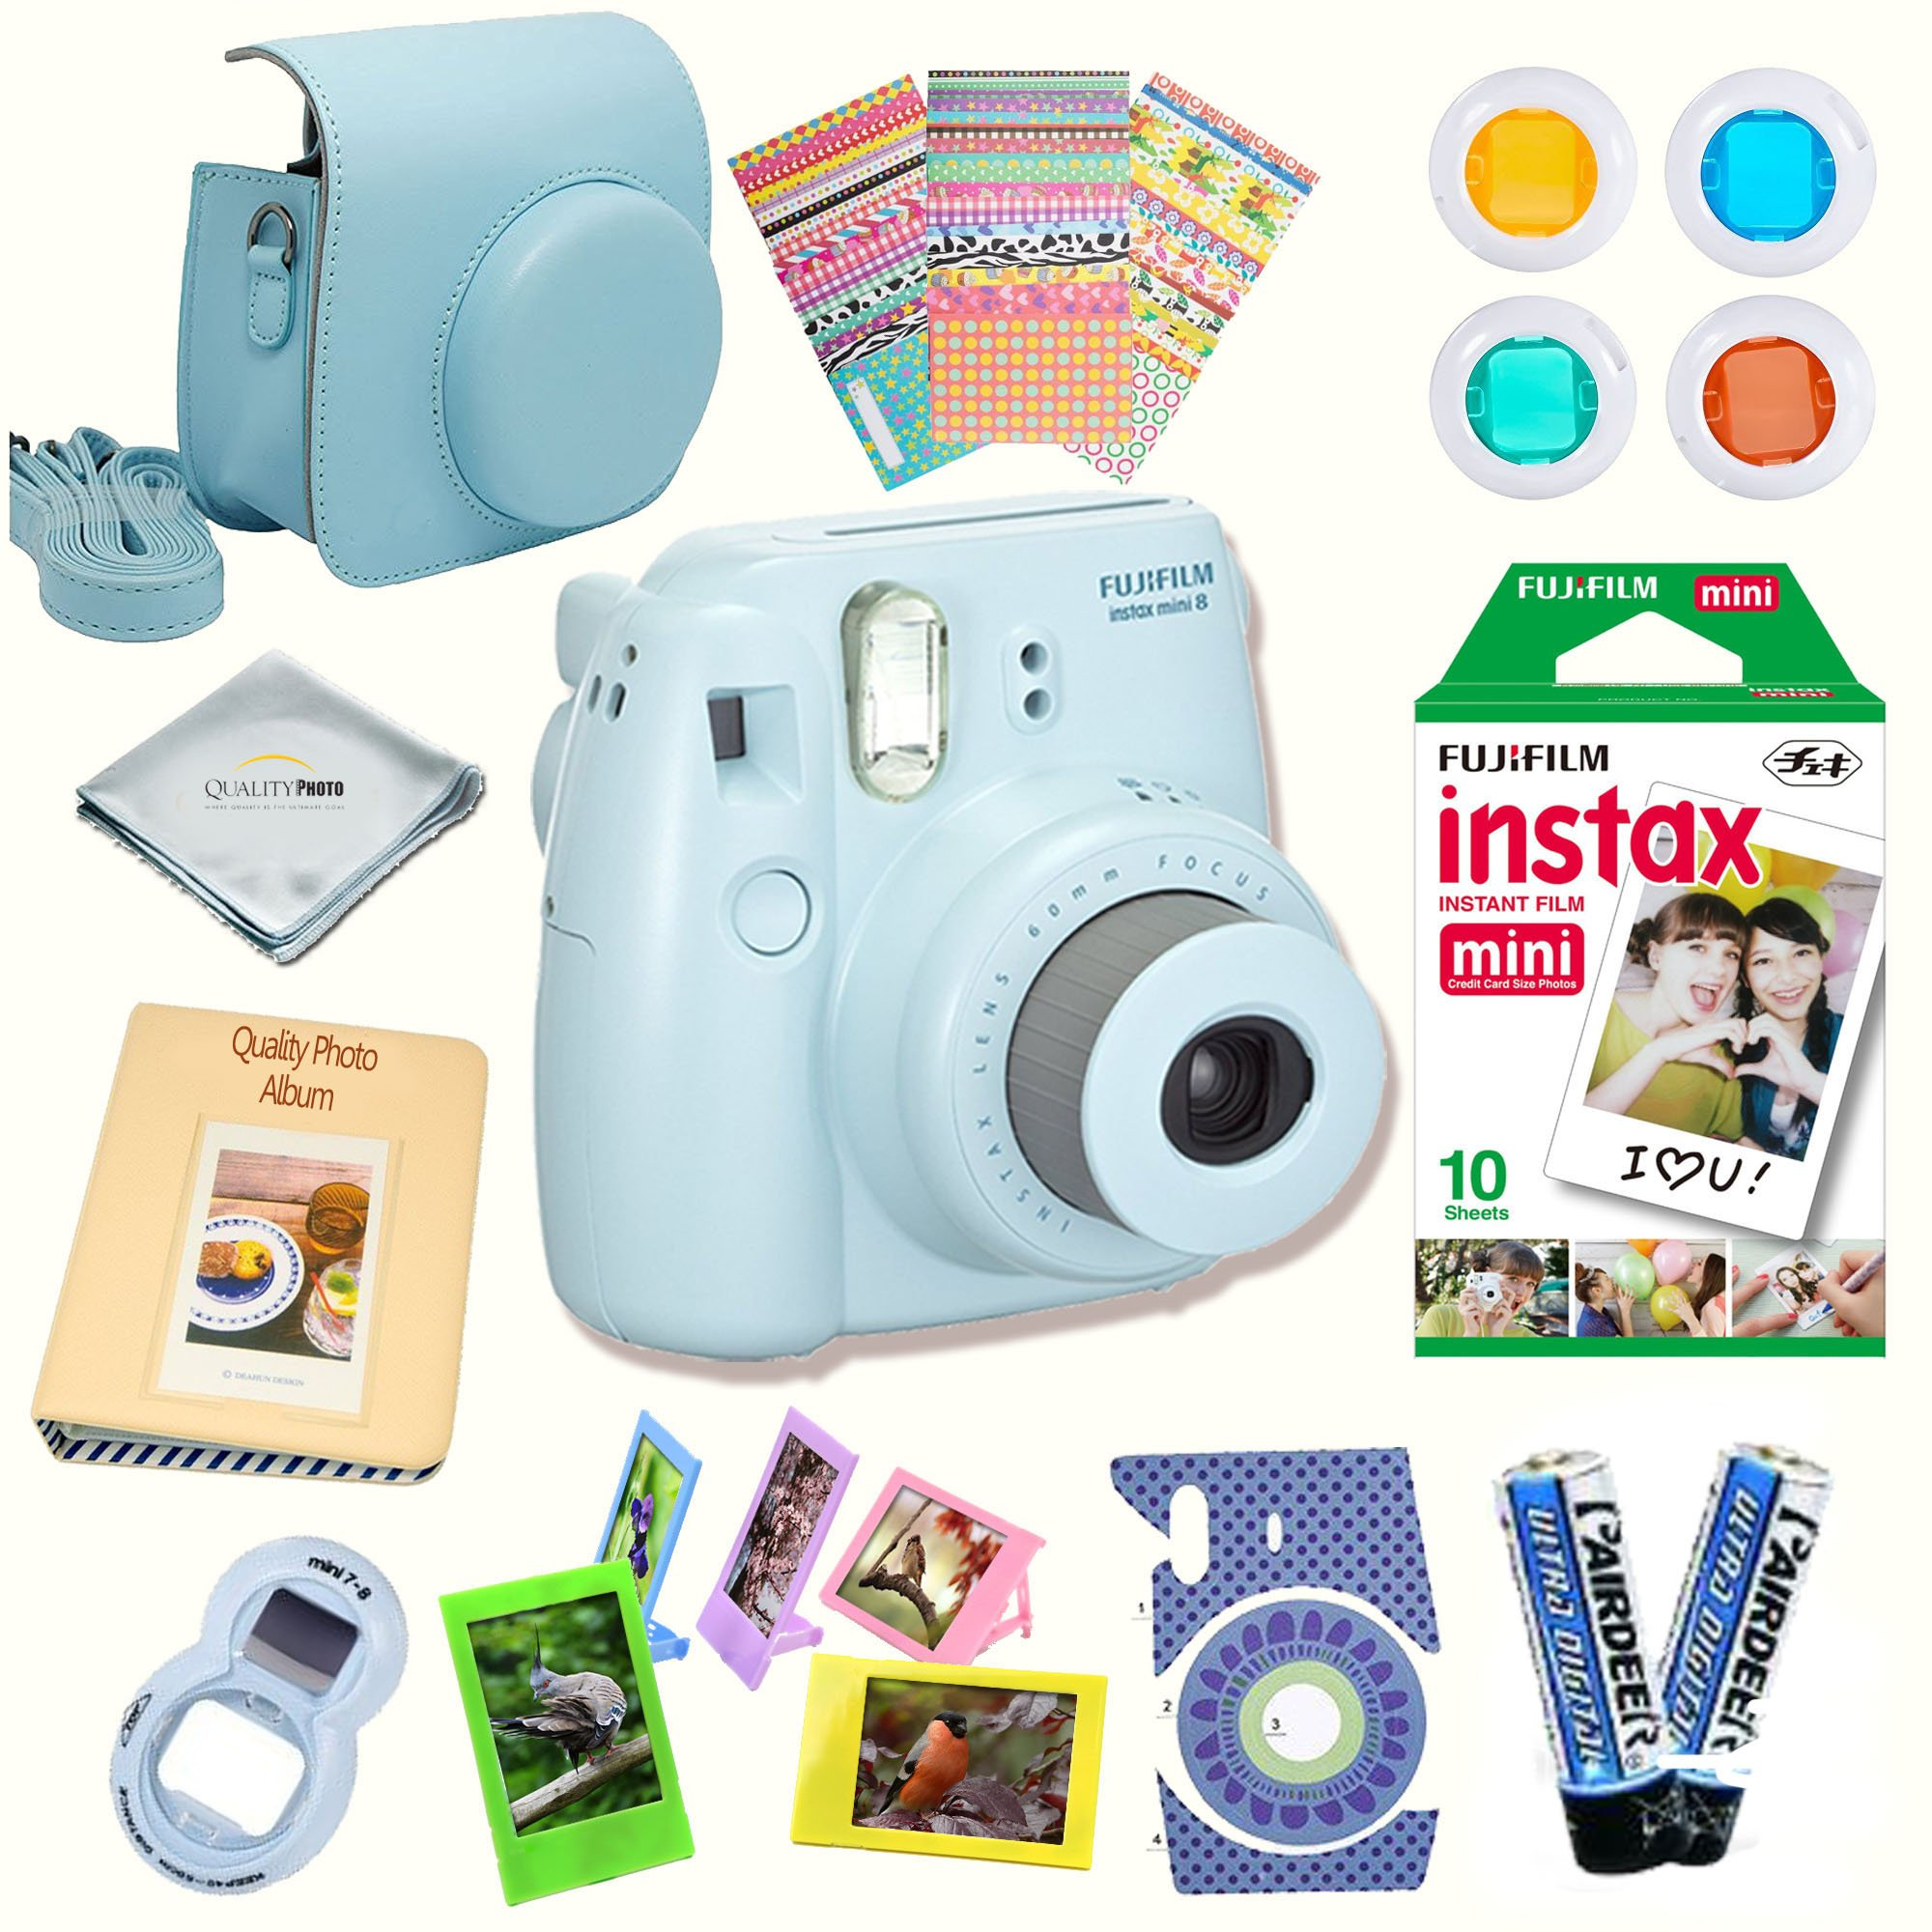 Fujifilm Instax Mini 8 Camera + Fuji INSTAX Instant Film (10 SHEETS) + 14 PC Instax Accessories kit Bundle, Includes; Instax Case + Album + Frames & Stickers + Lens Filters + MORE (Blue)